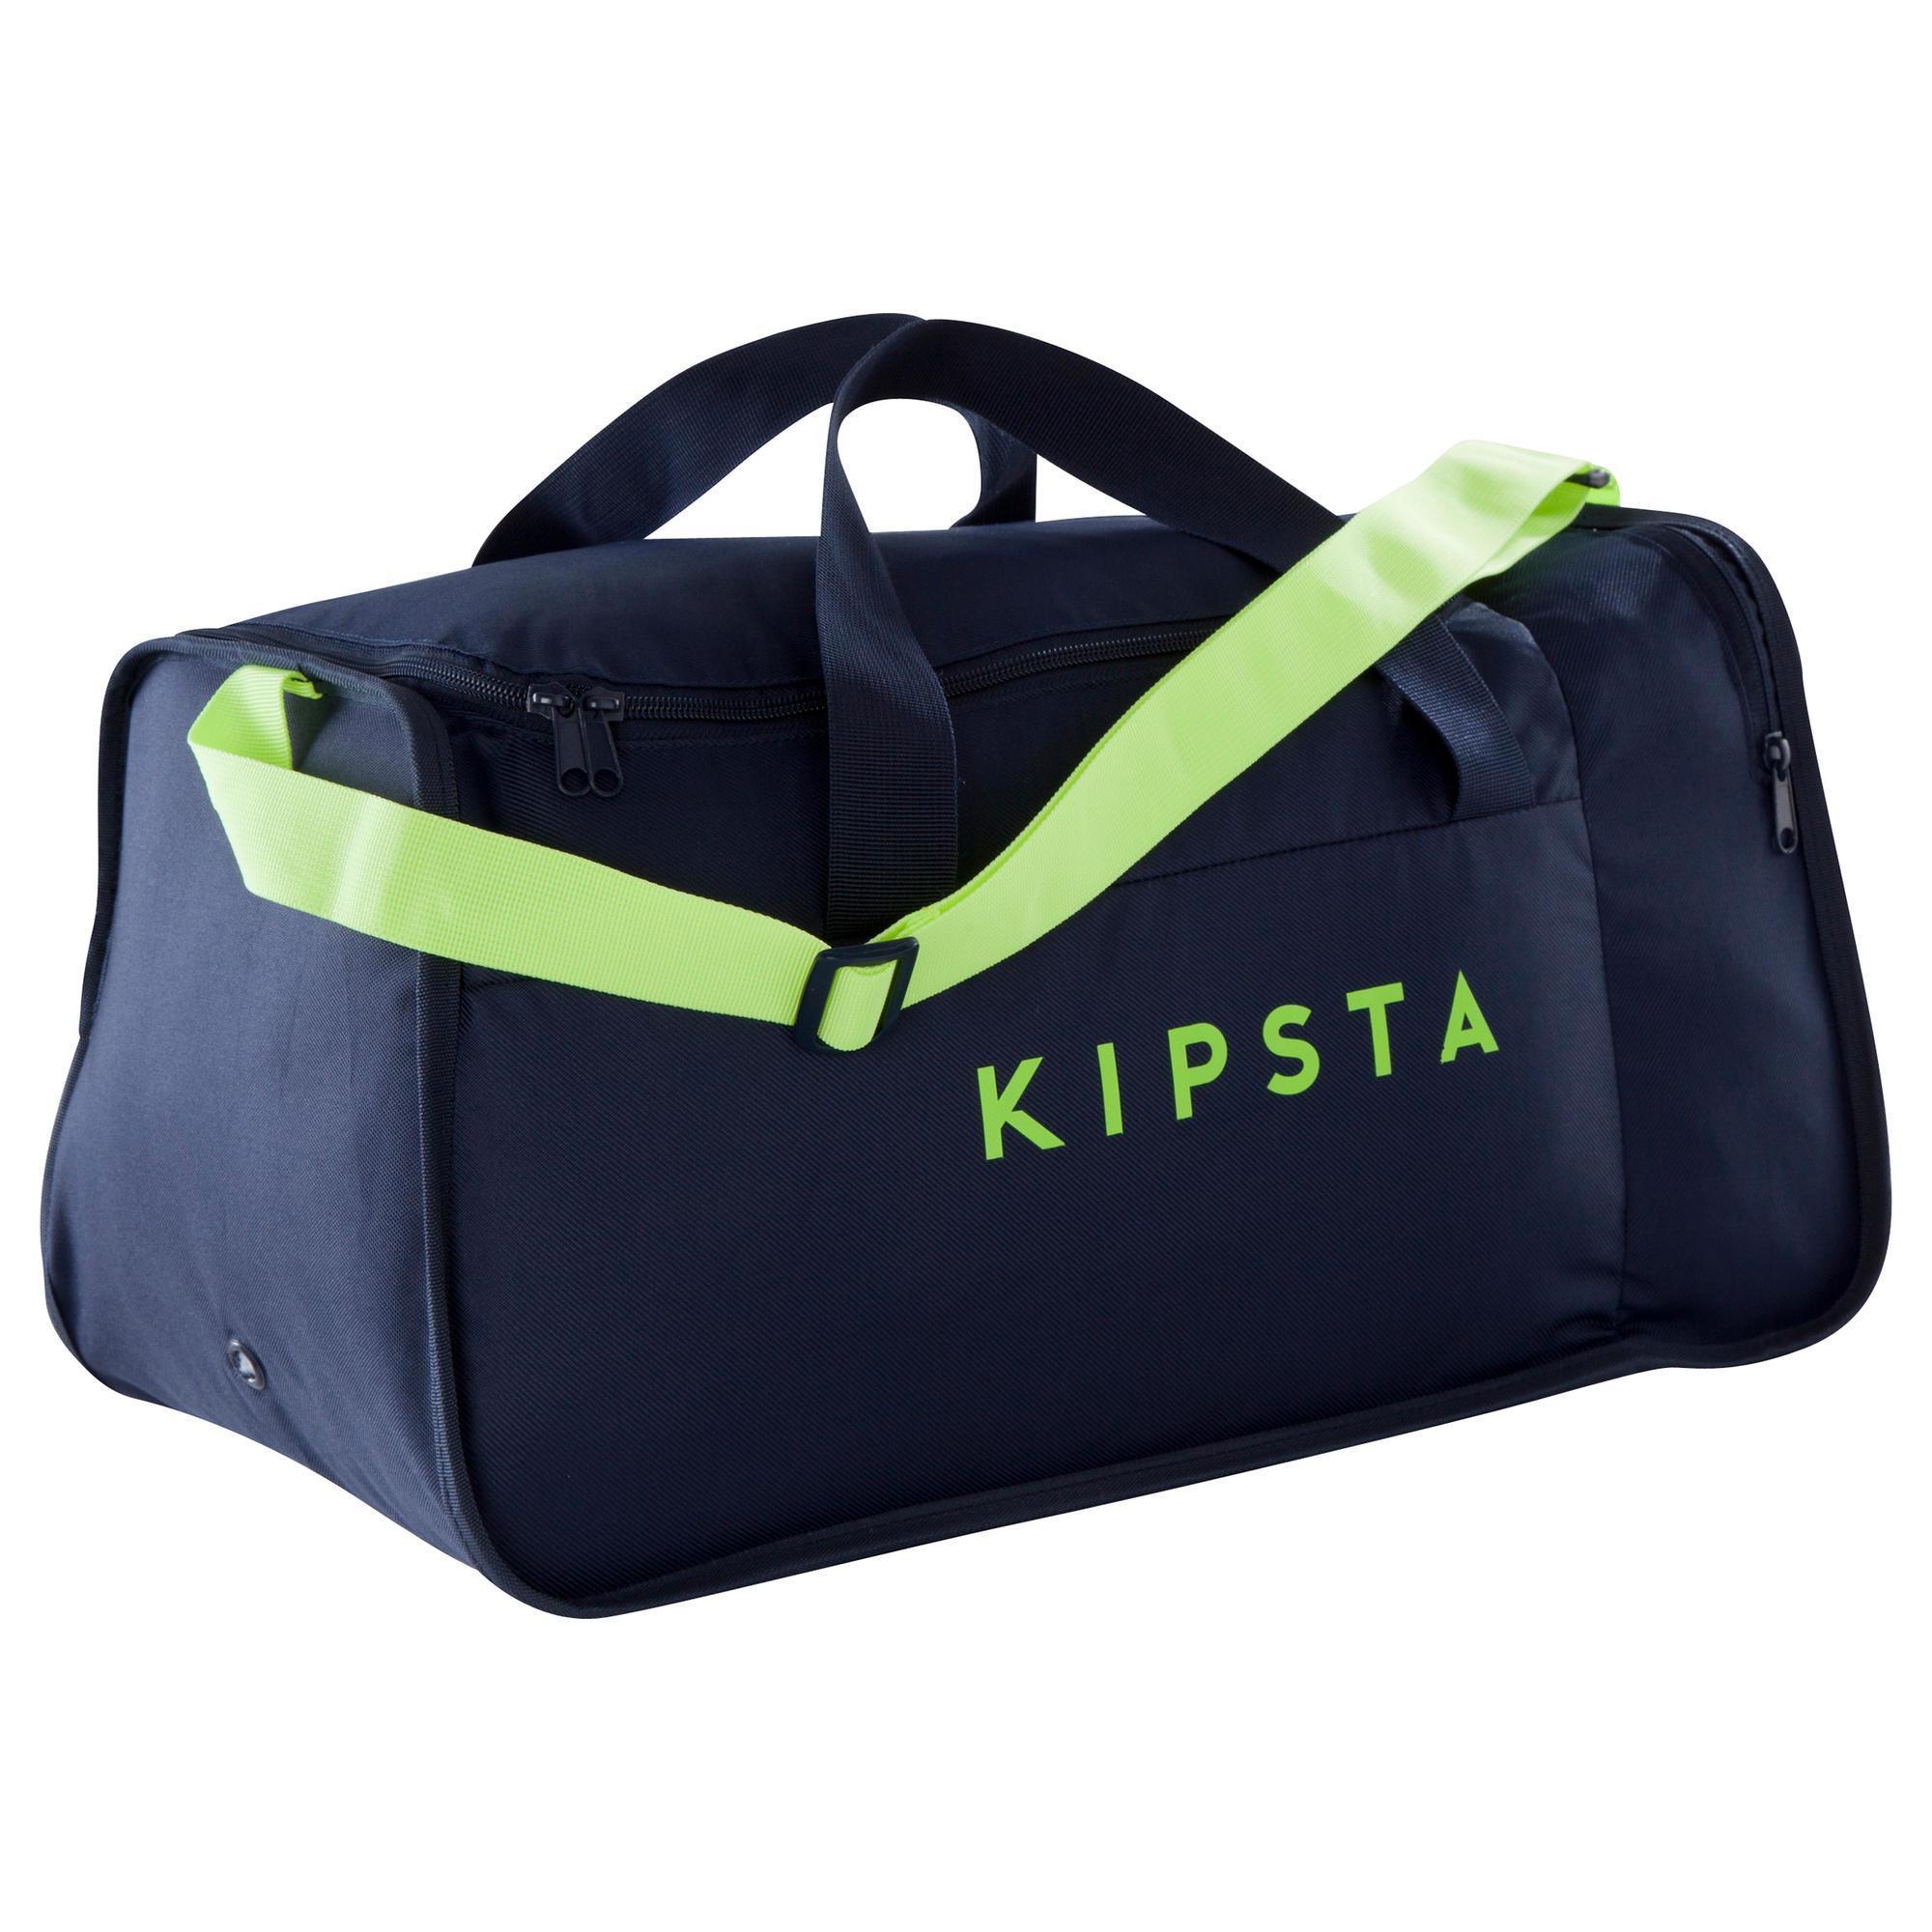 sac de sports collectifs kipocket 40 litres bleu jaune kipsta. Black Bedroom Furniture Sets. Home Design Ideas